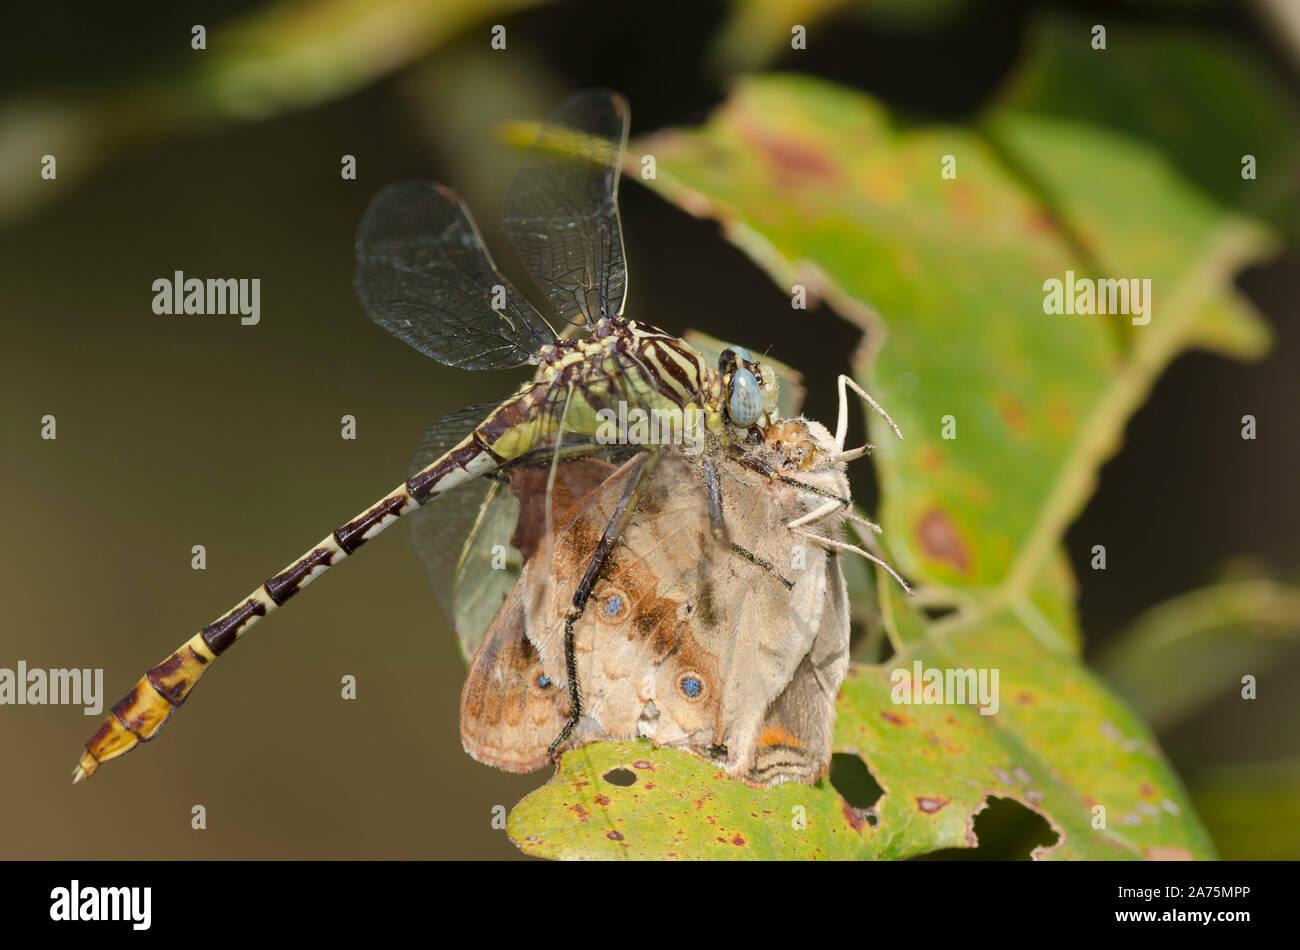 Flag-tailed Spinyleg, Dromogomphus spoliatus, feeding on captured Common Buckeye, Junonia coenia Stock Photo